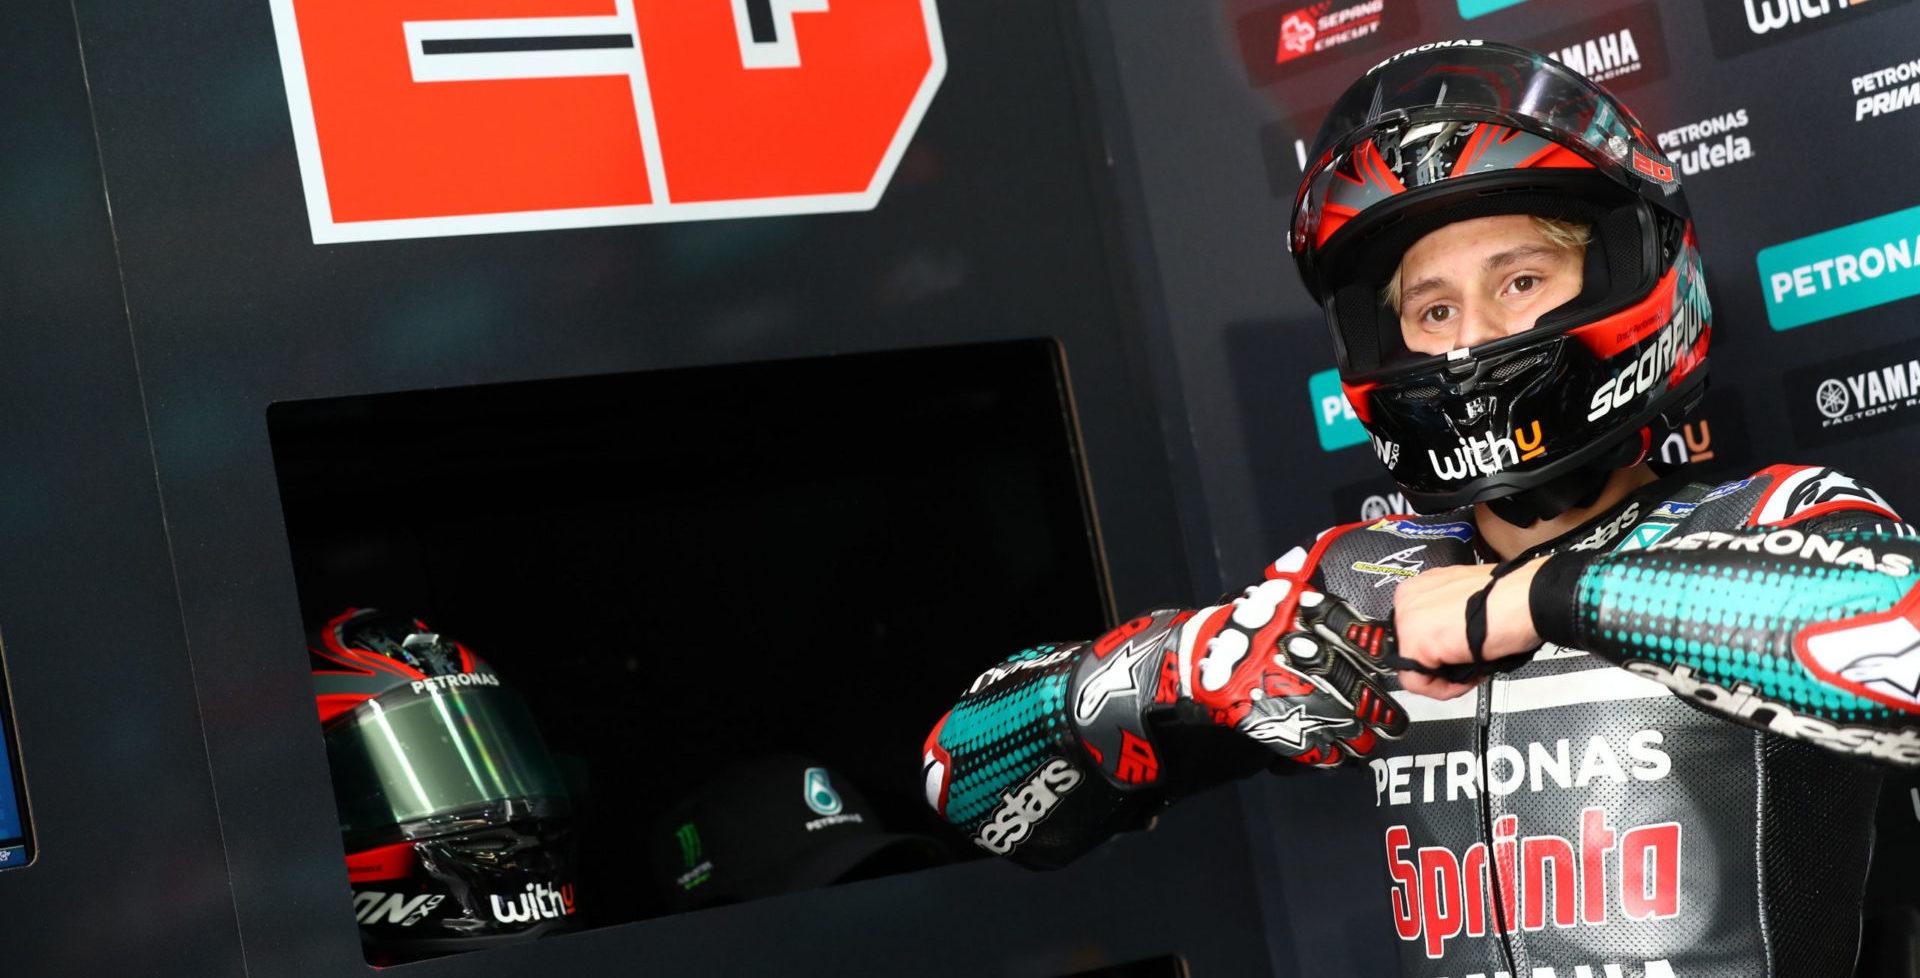 Fabio Quartararo. Photo courtesy of PETRONAS Yamaha Sepang Racing Team.